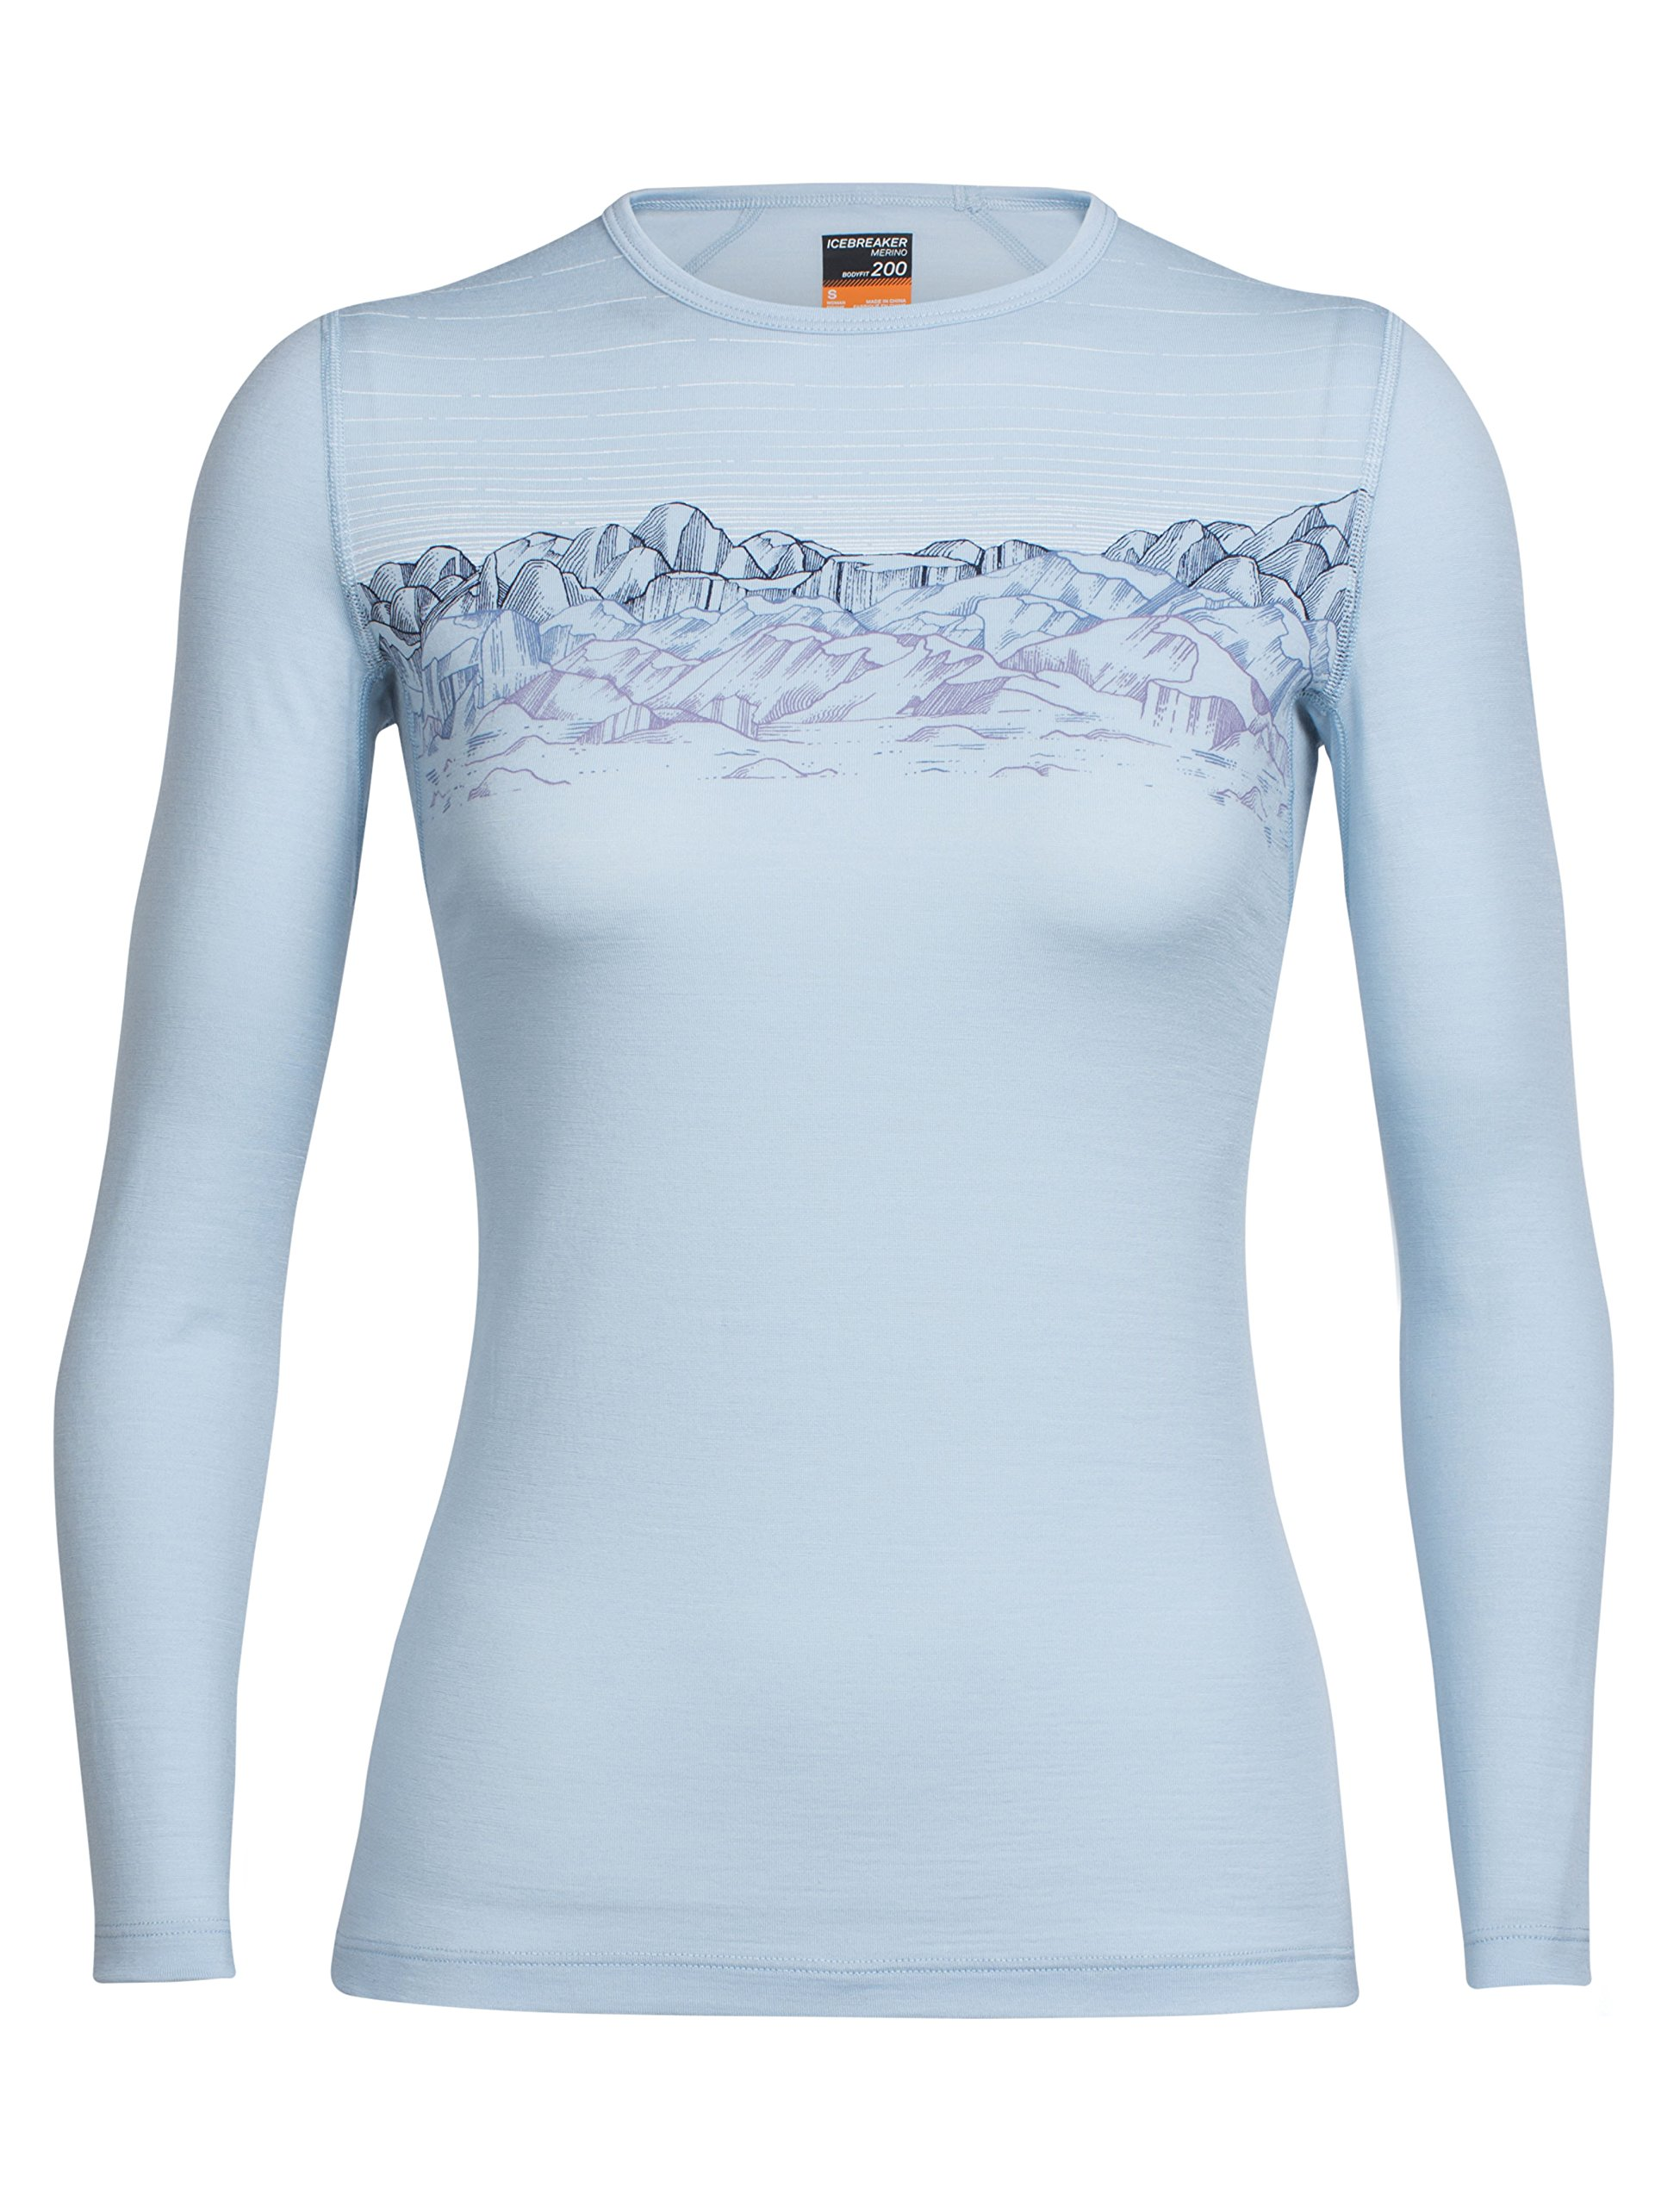 Icebreaker Merino Women's Oasis Long Sleeve Crewe, Sunset Sky - Ice Blue, X-small